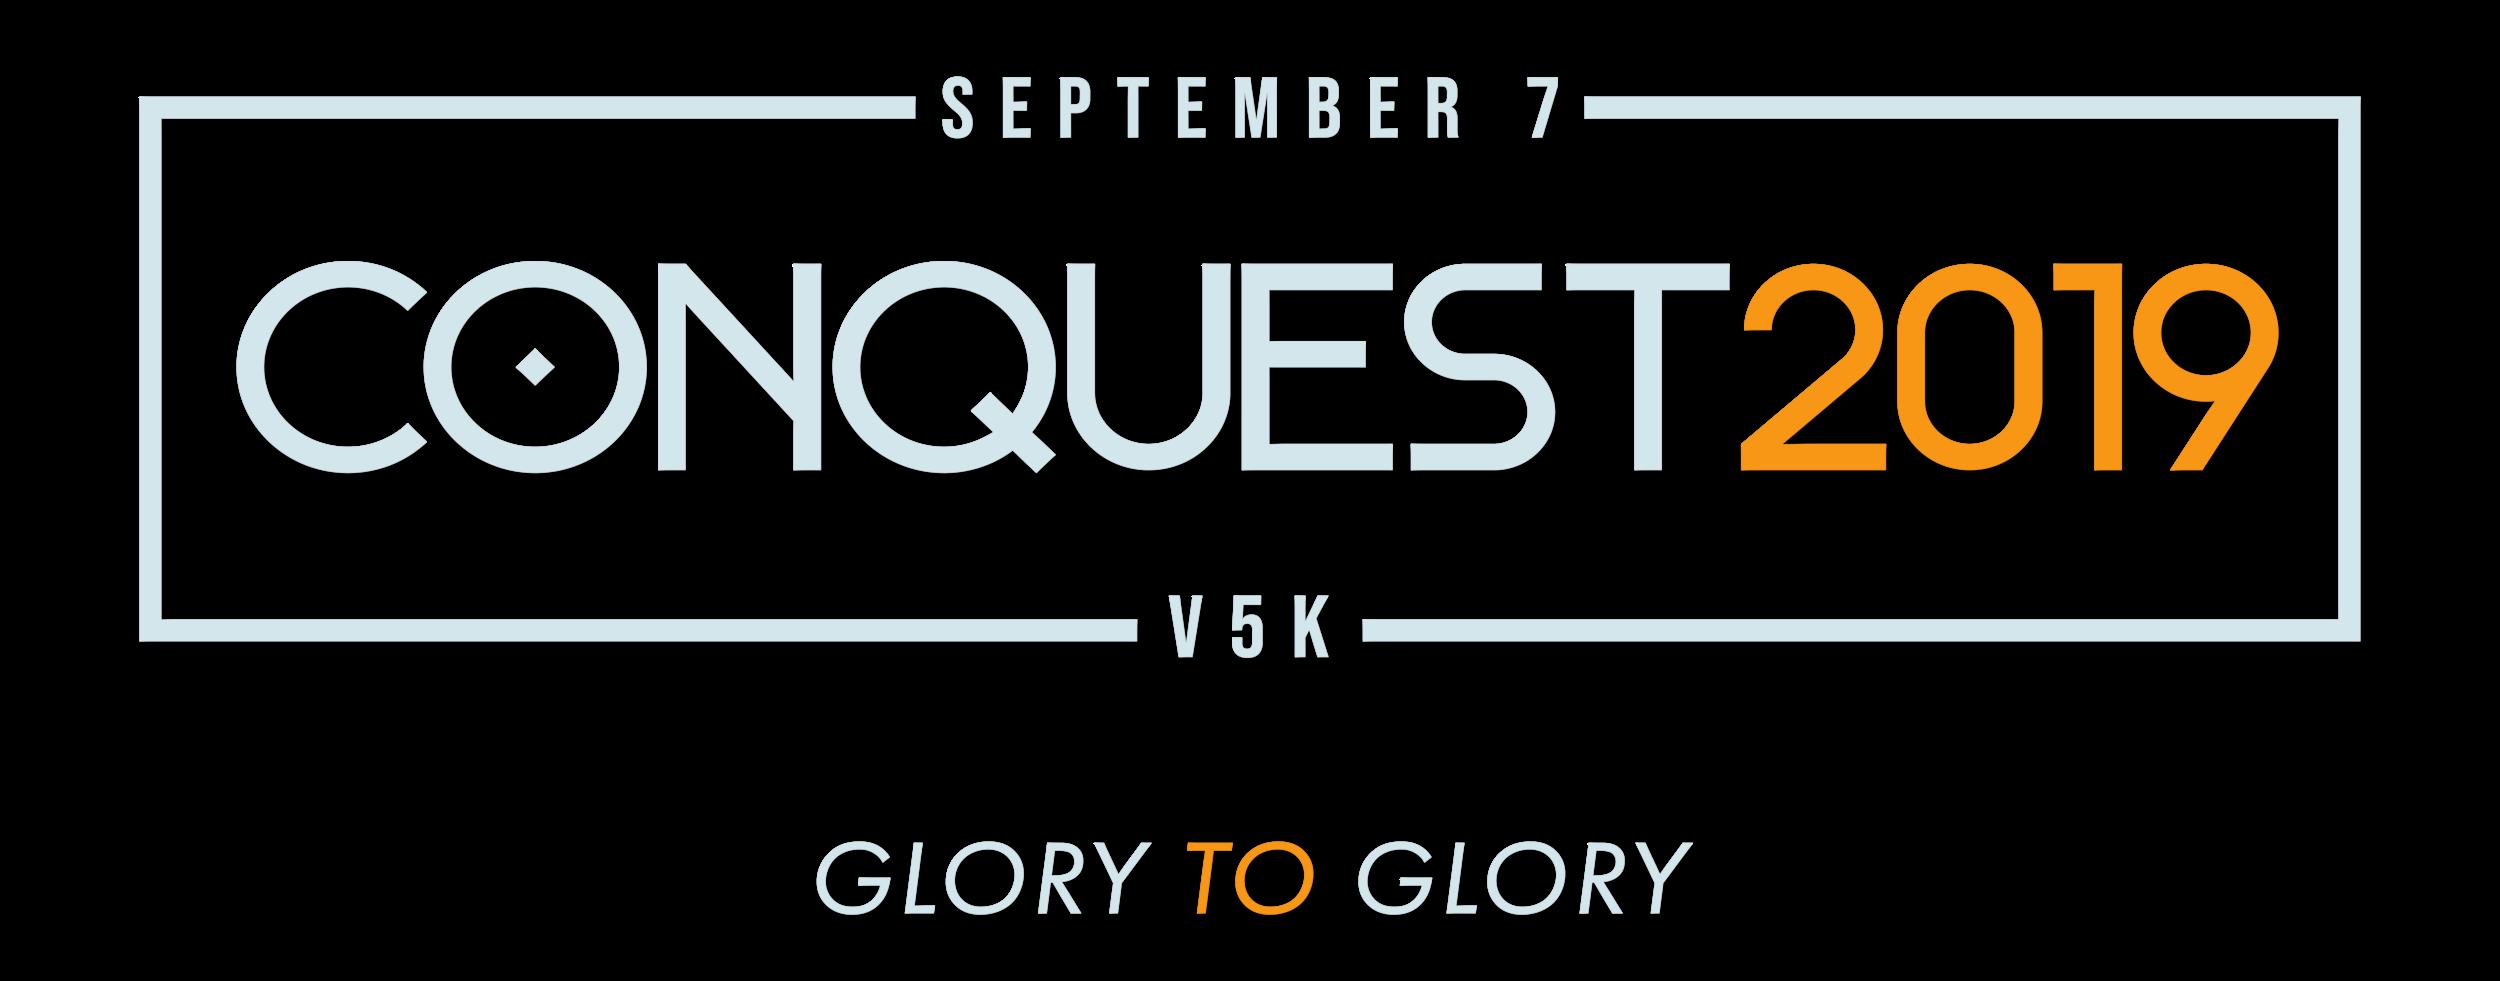 Conquest 2019-09.png